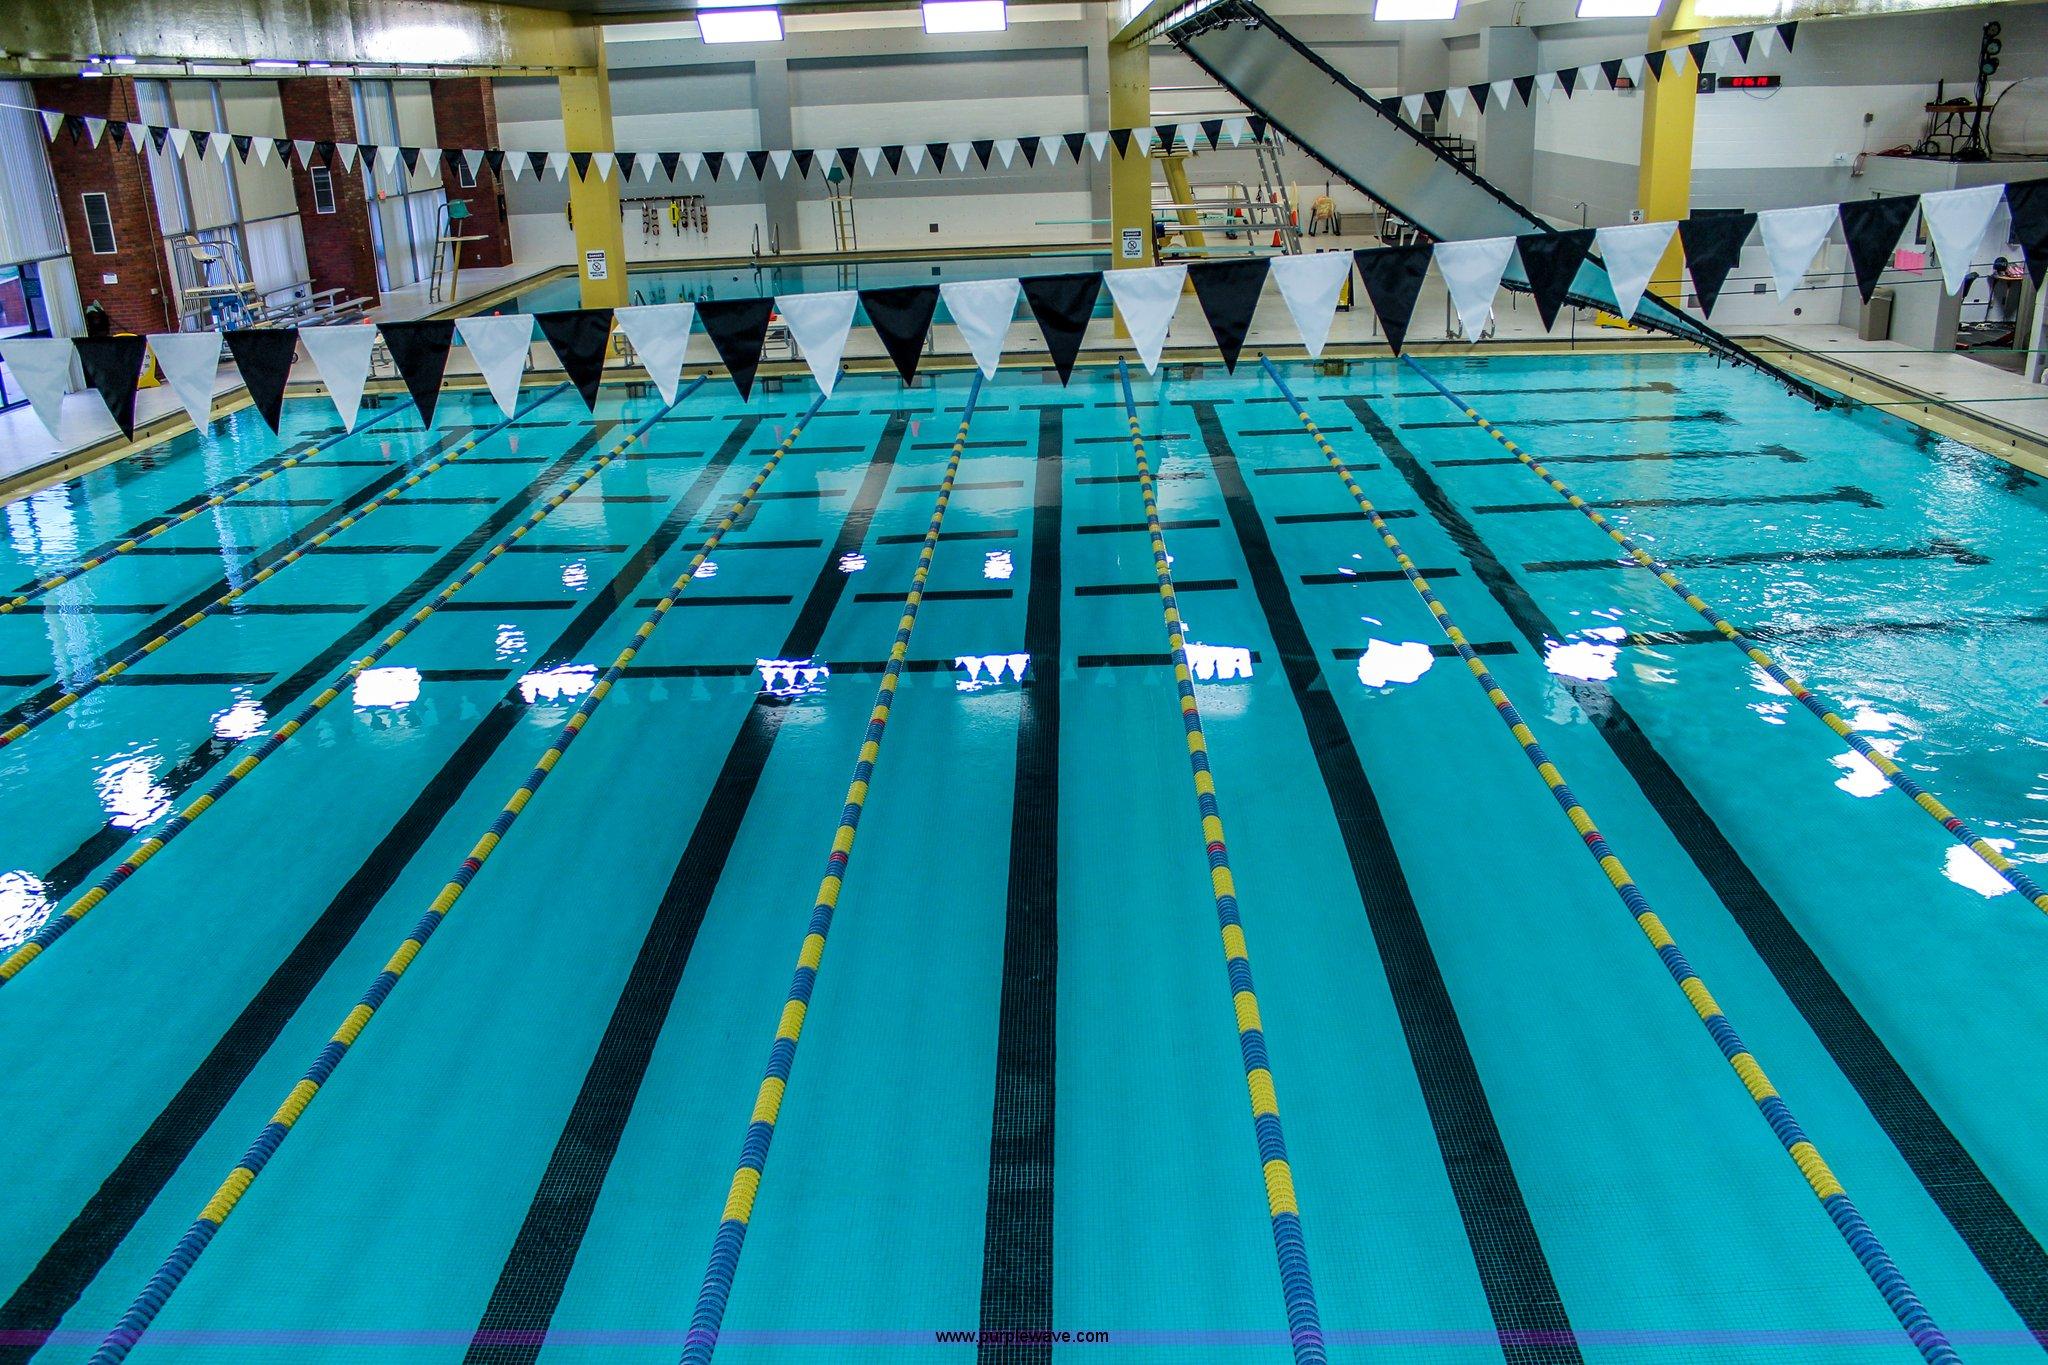 8) swimming pool lane lines | Item D1493 | 6-2-2015